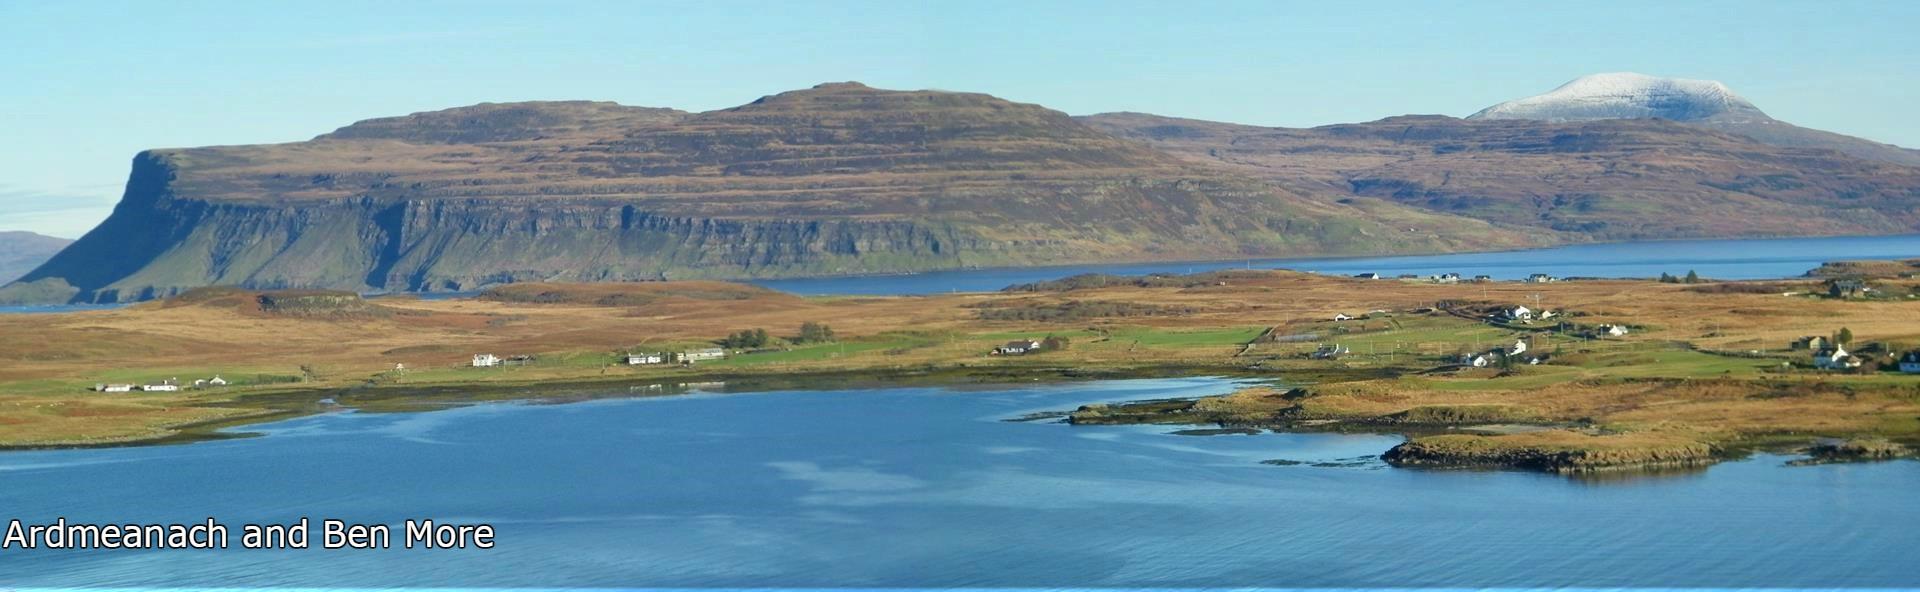 Ardtun,Burg,Ardmeanach,Ben More, Isle of Mull